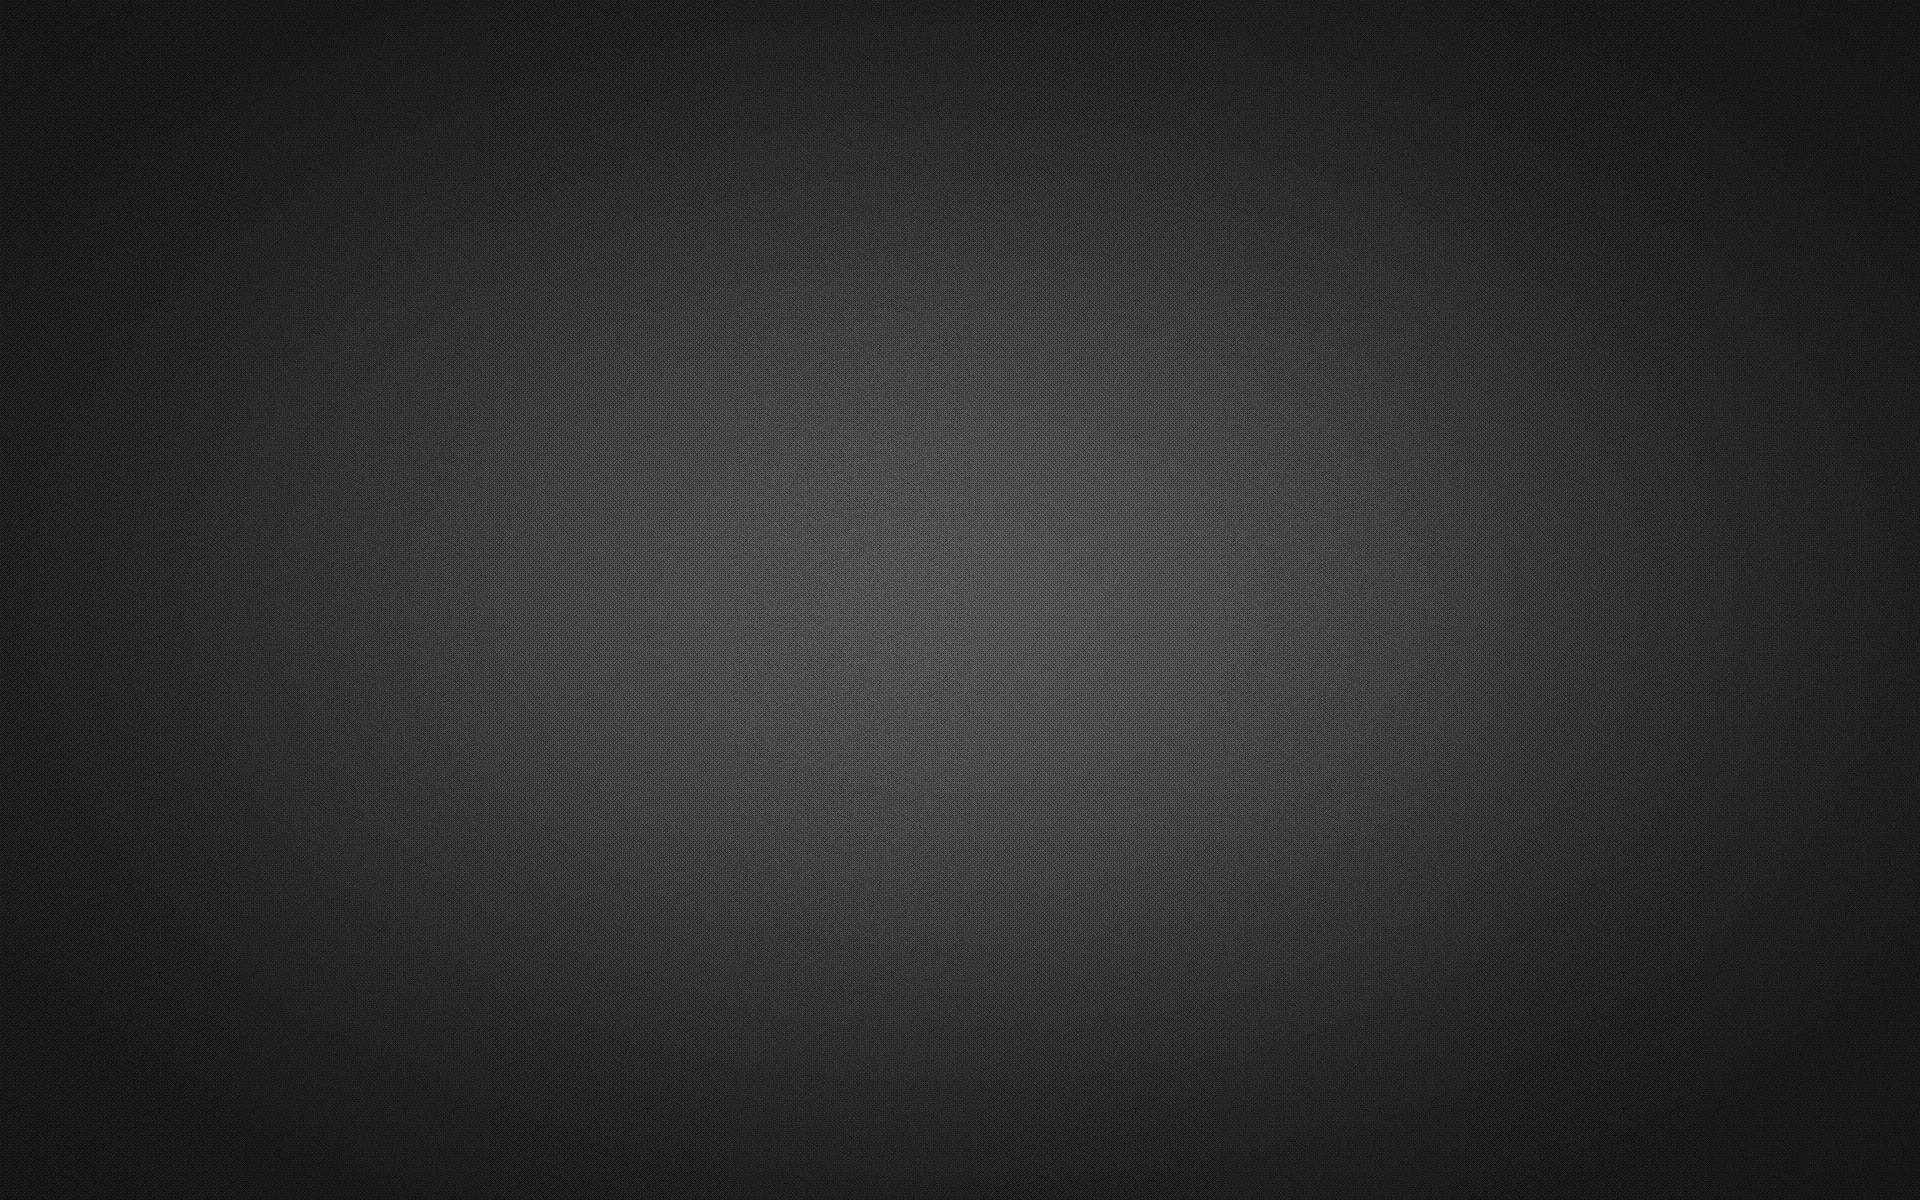 Black Grey Background   1314739 1920x1200